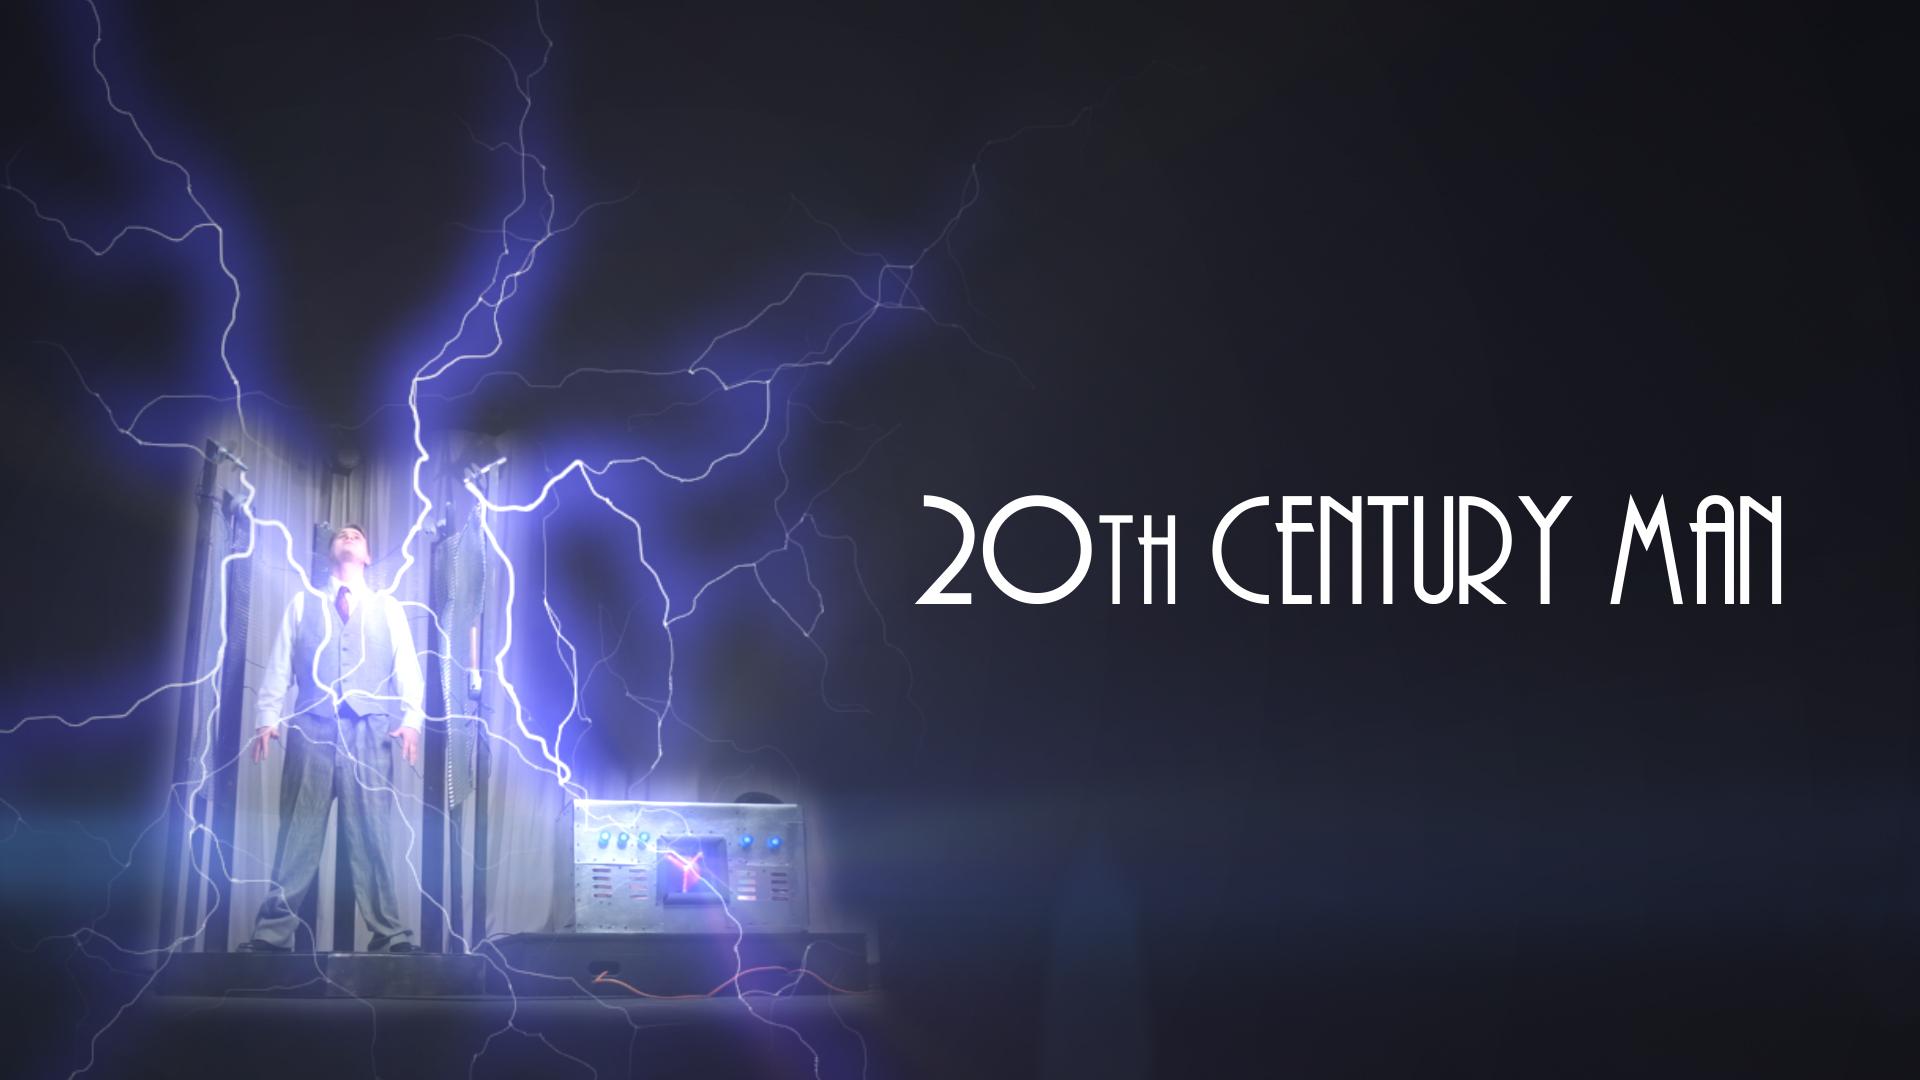 20th Century Man